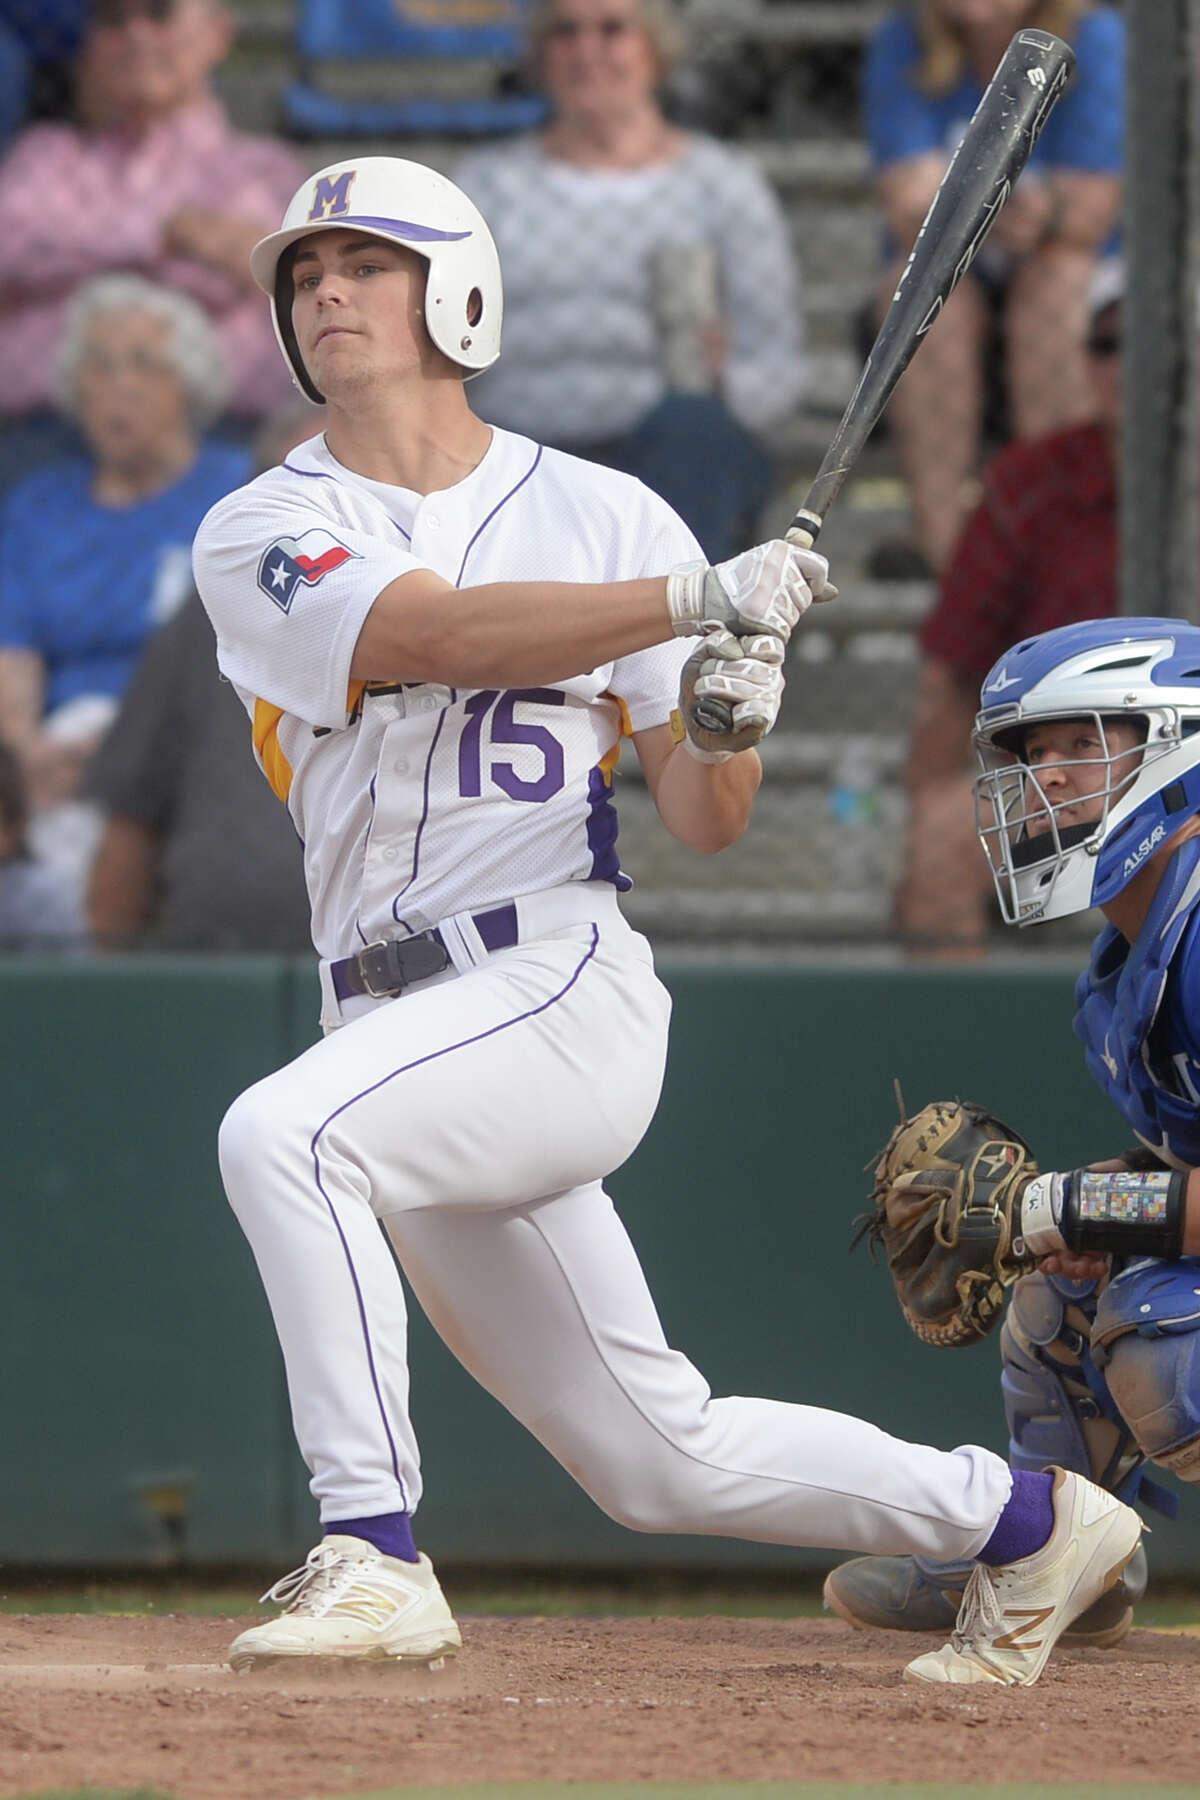 Midland High's Jackson Anuszkiewicz (15) bats against Frenship on April 28, 2017, at Zachery Field. James Durbin/Reporter-Telegram